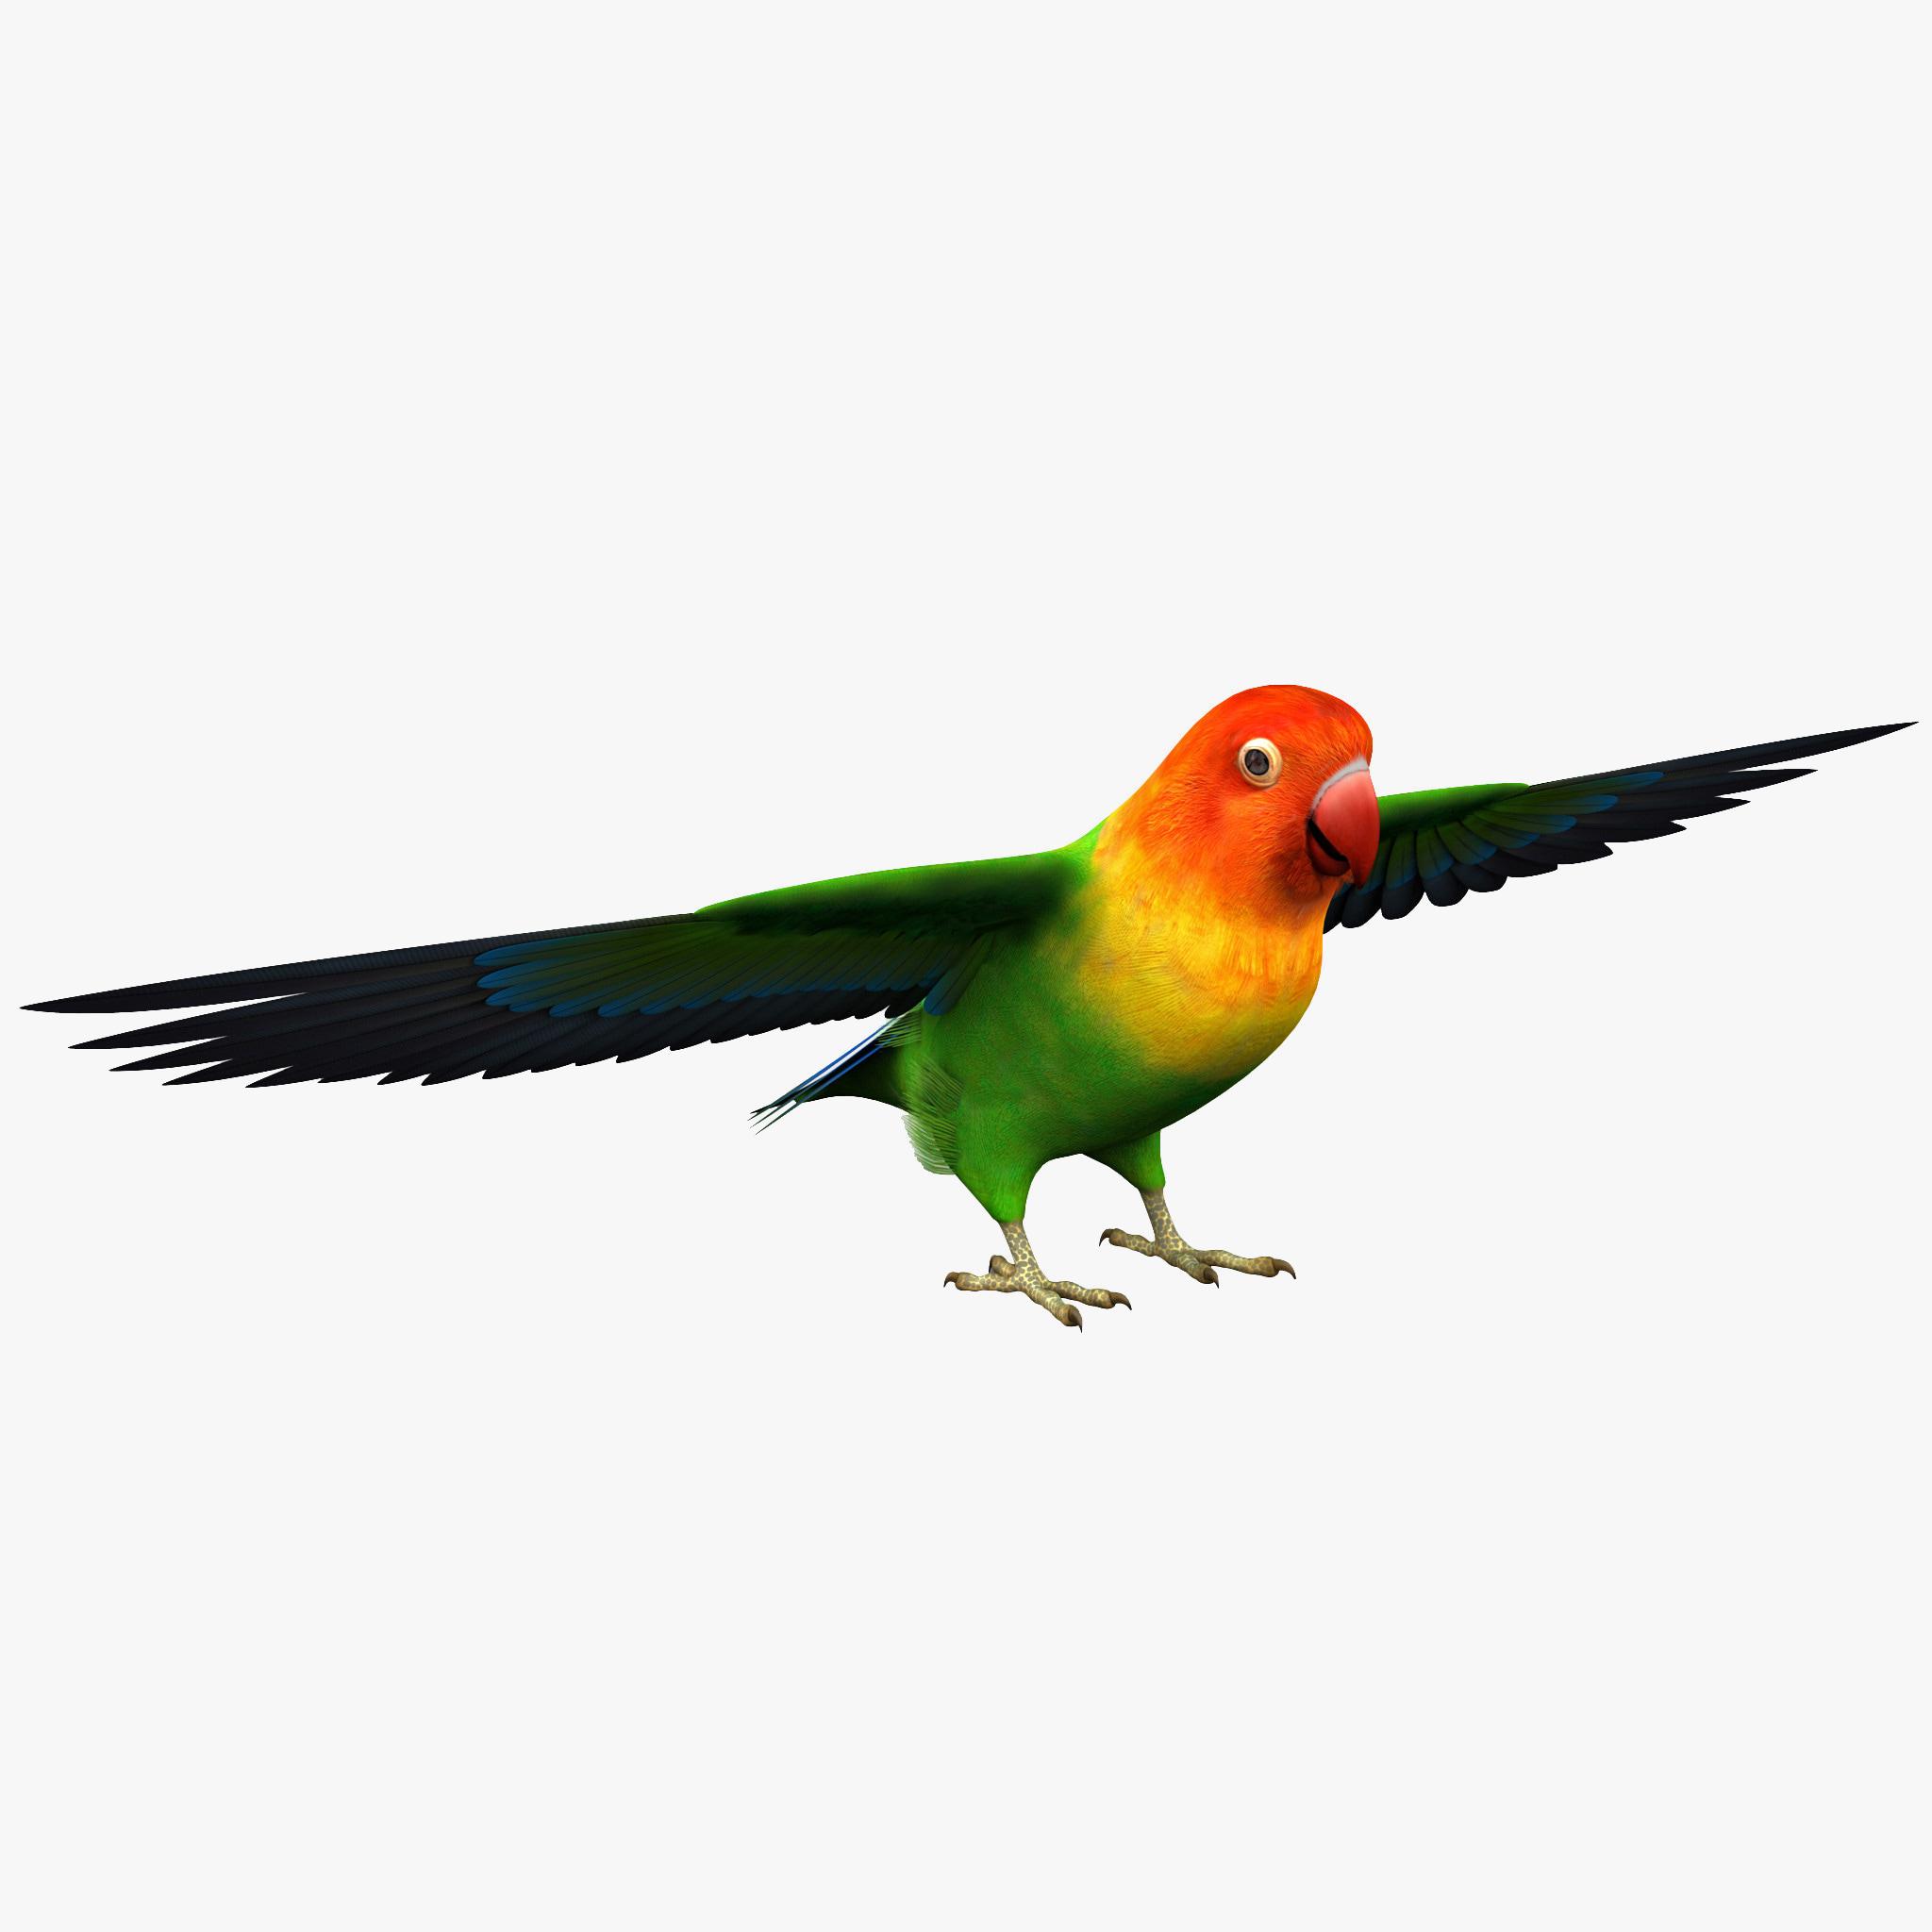 251748_Lovebird_000.jpgf6658a4c-5166-4b4c-89ac-9127c978787eOriginal.jpg